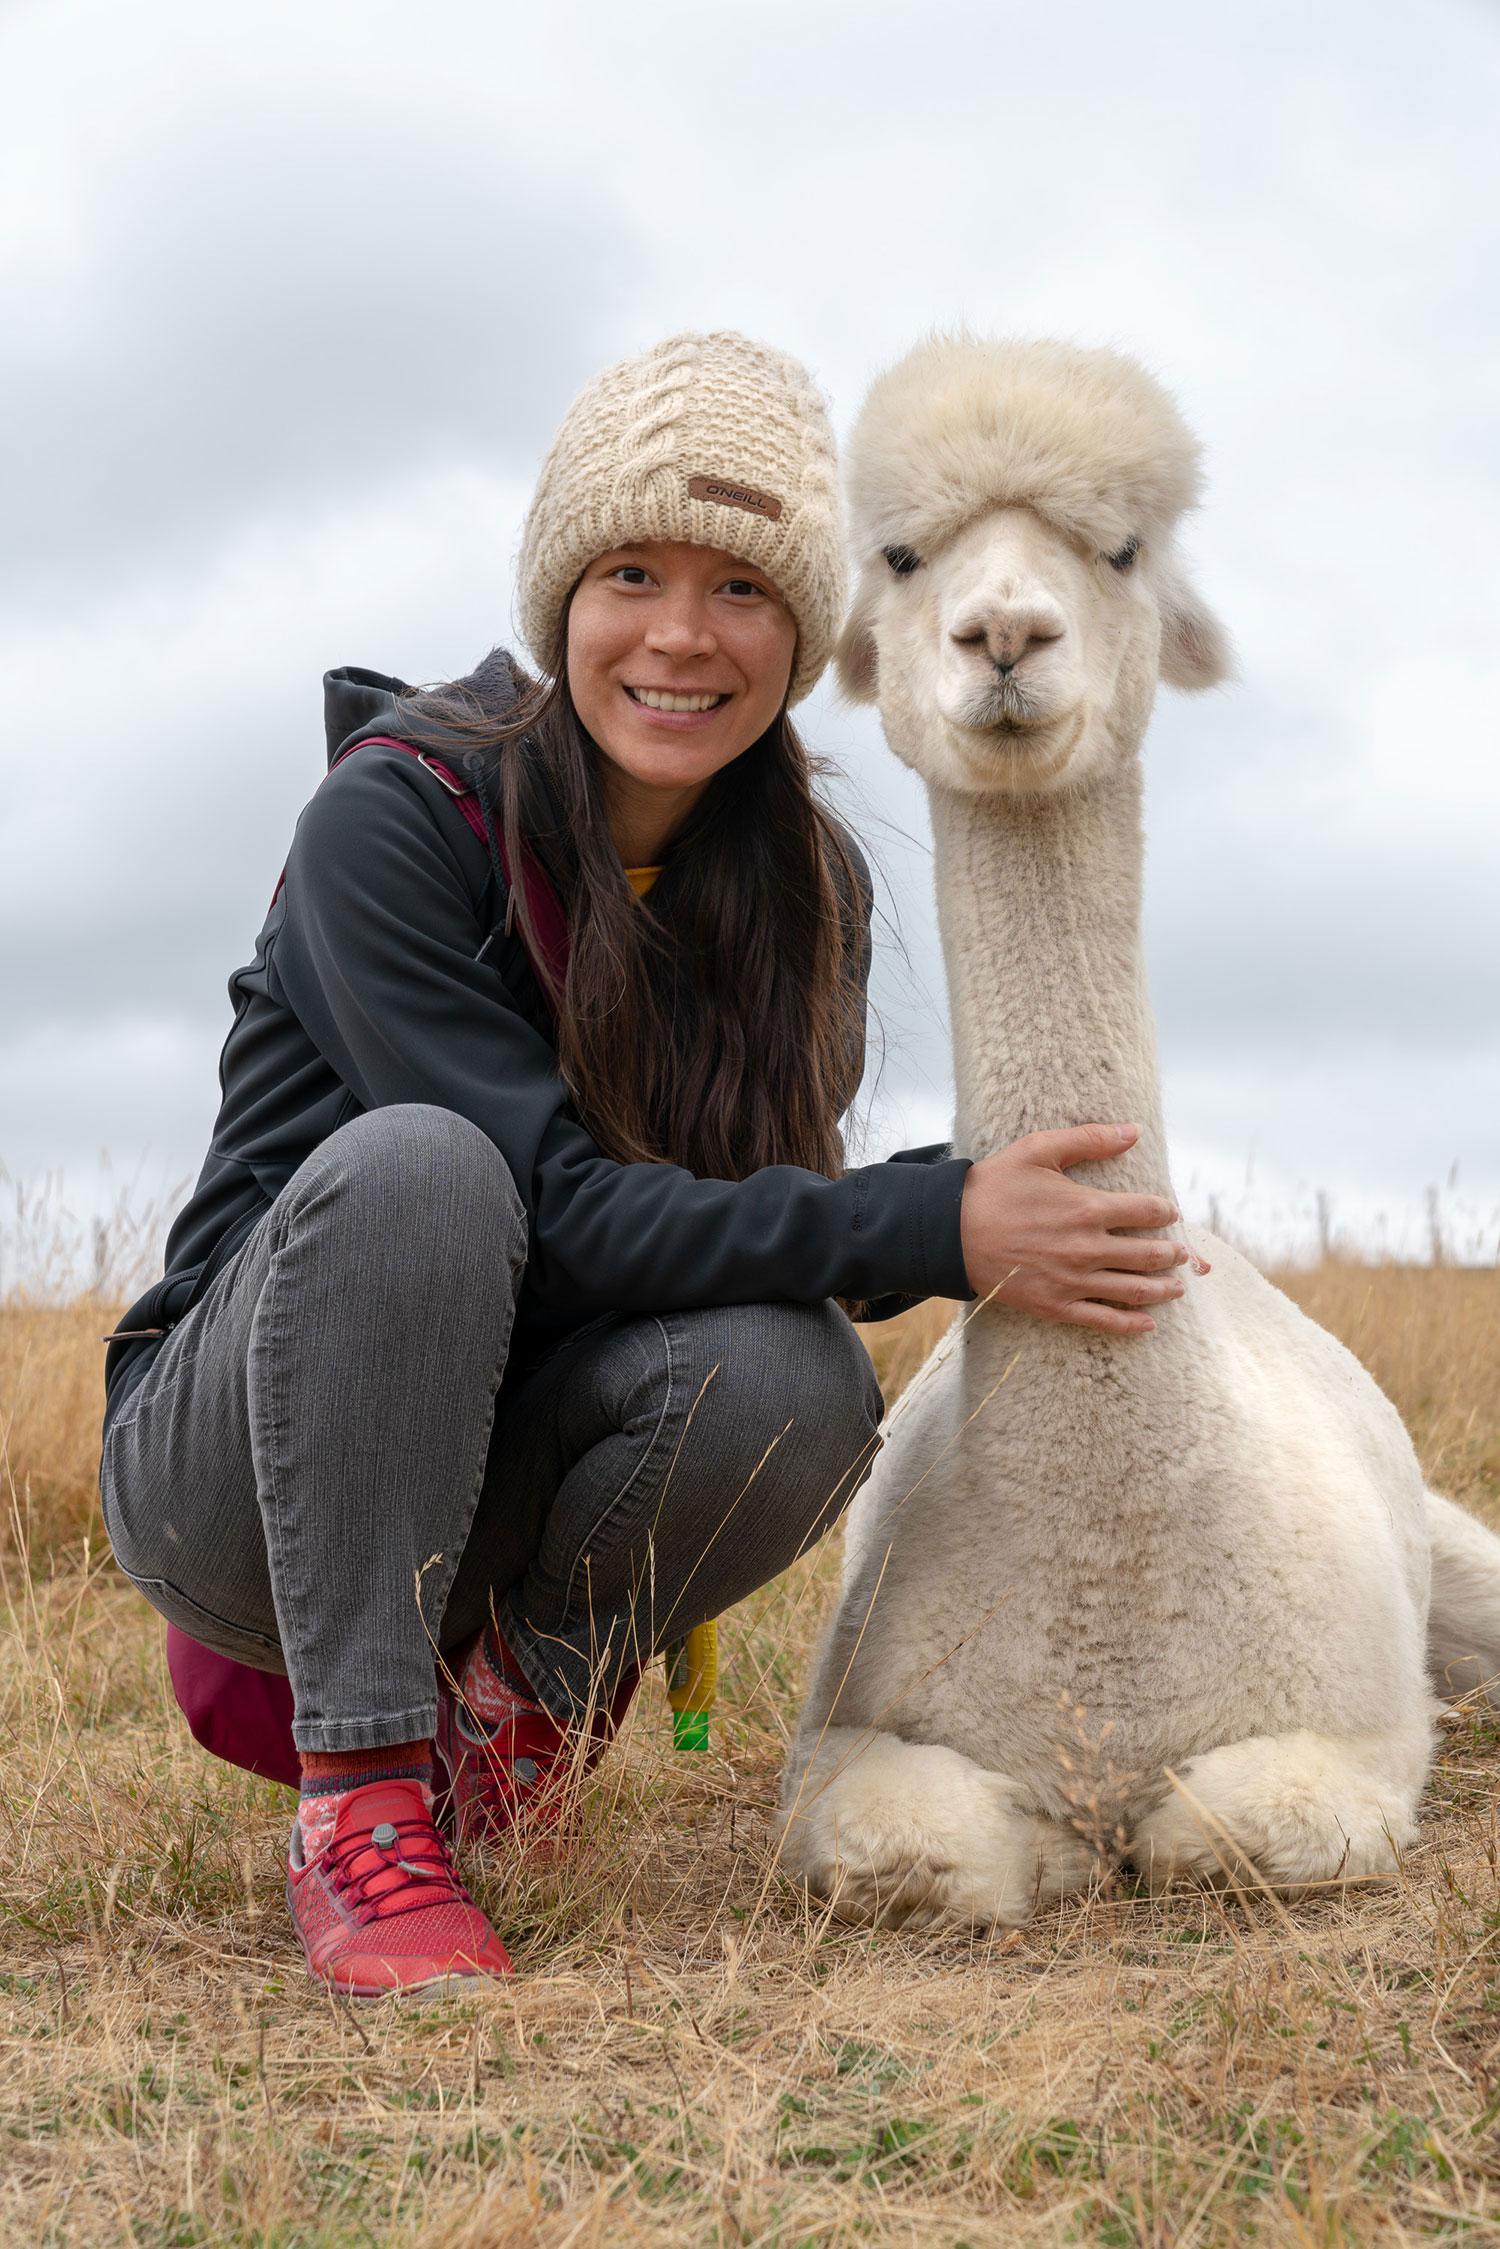 Thaneeya McArdle with an alpaca at Shamarra Alpaca Farm in Akaroa, New Zealand